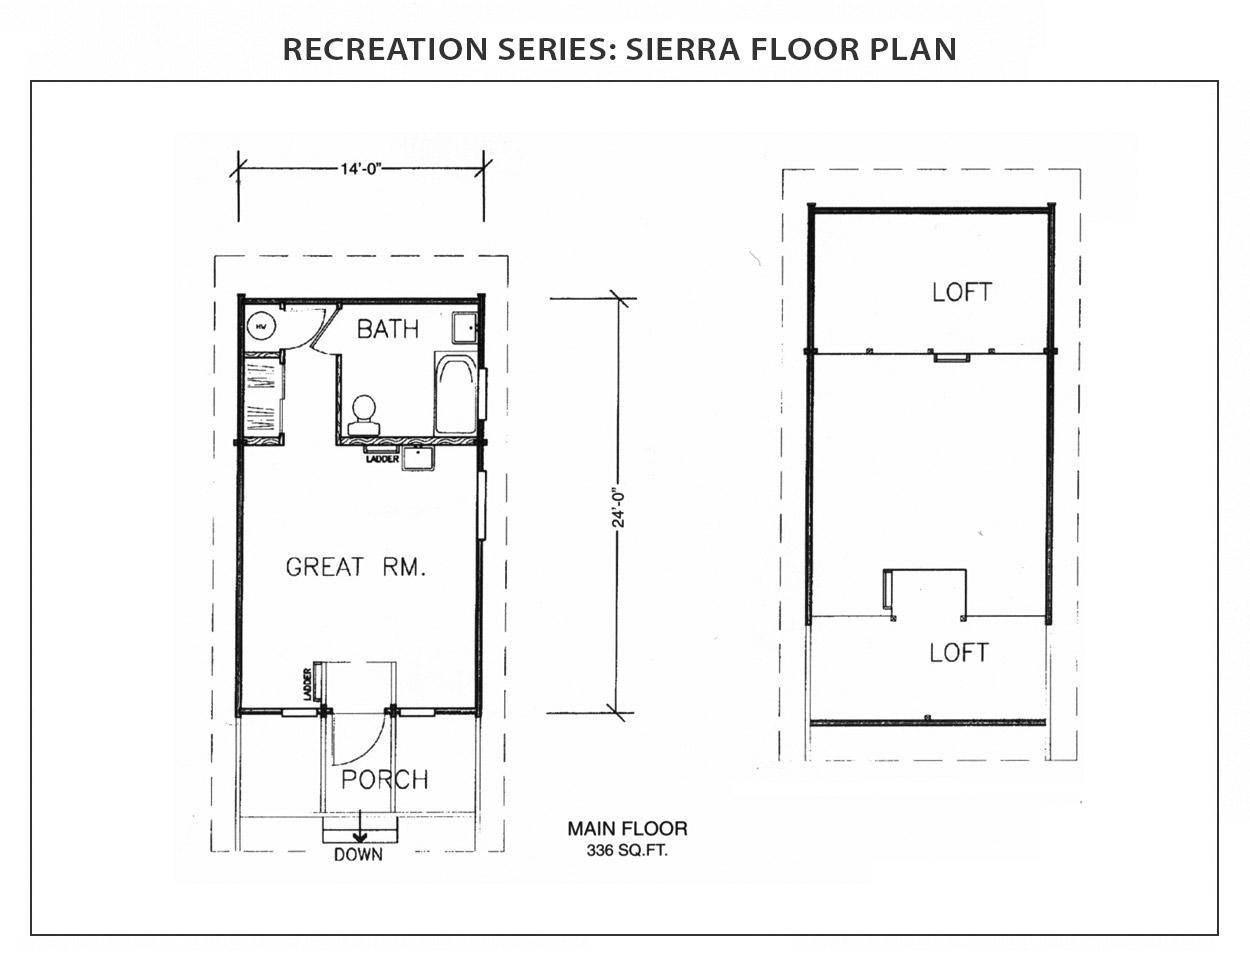 Sierra Floor Plan Recreation Series Ihc